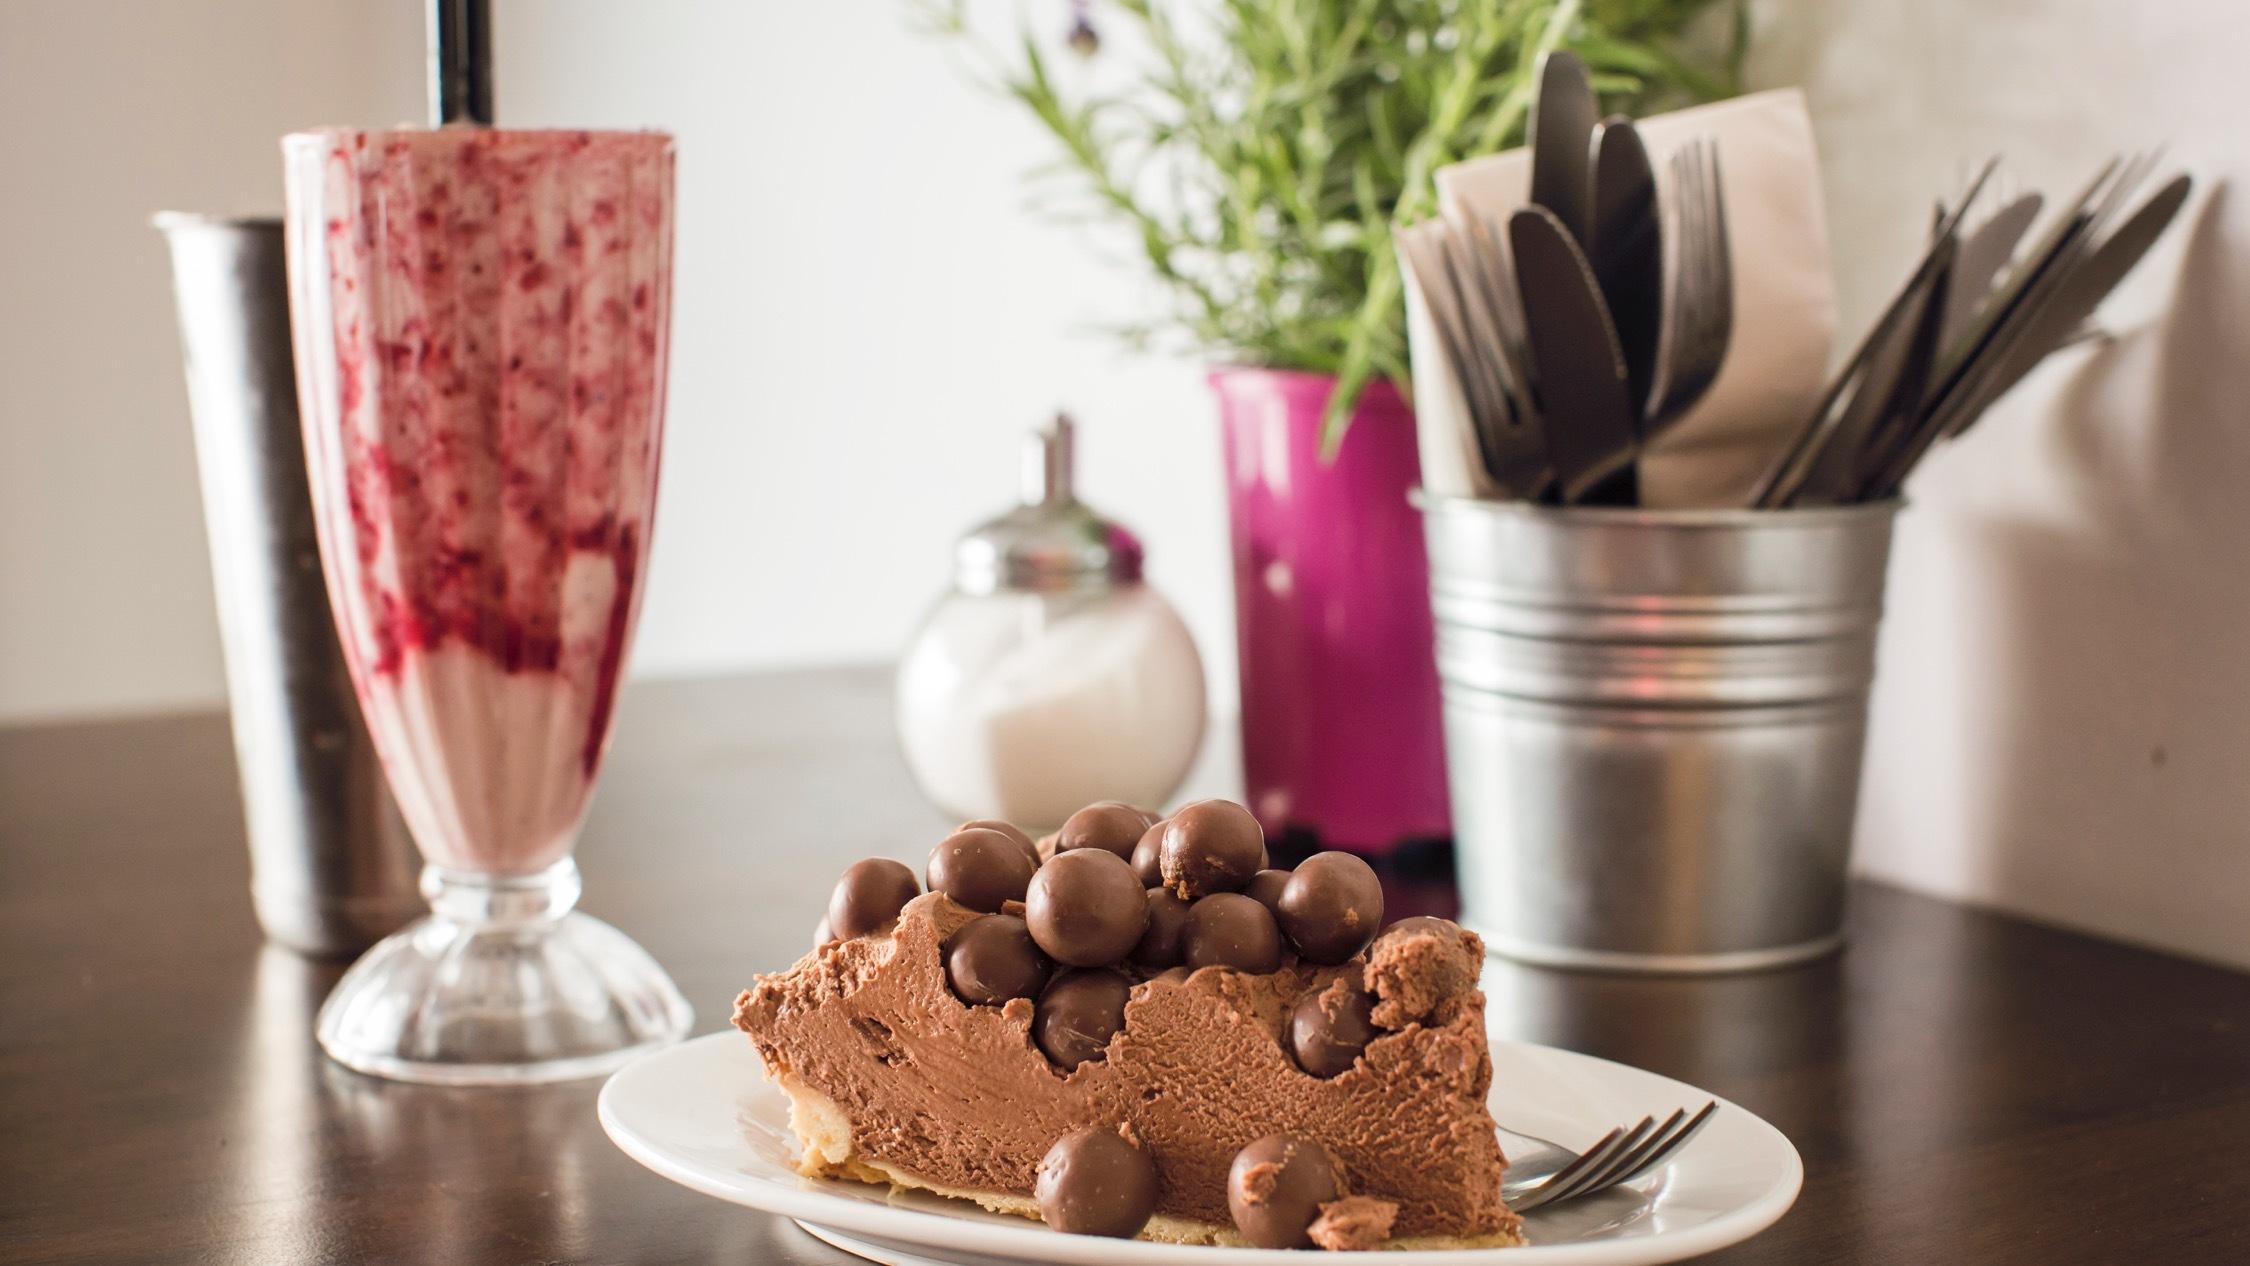 Cake at Milk Bar by Cafe Ish